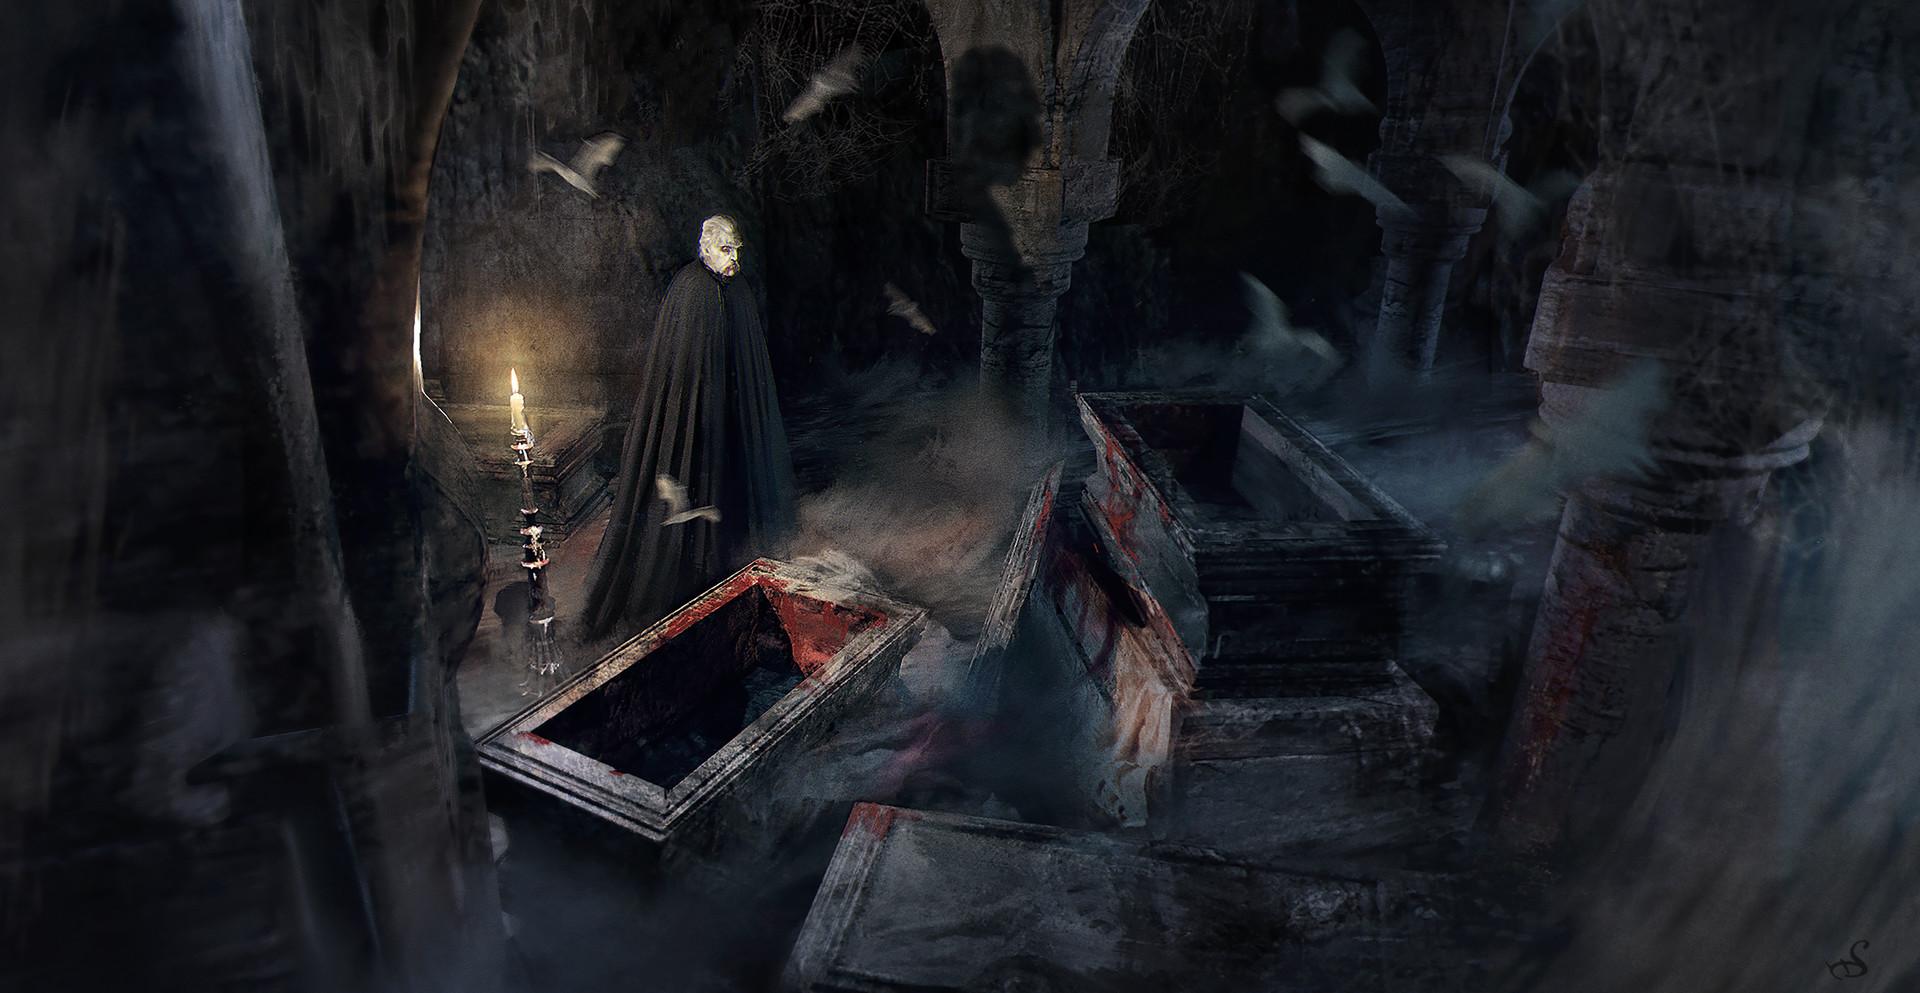 Sebastien ecosse dracula crypt vampire sebastien ecosse illustration tomb 300dpi bonordre